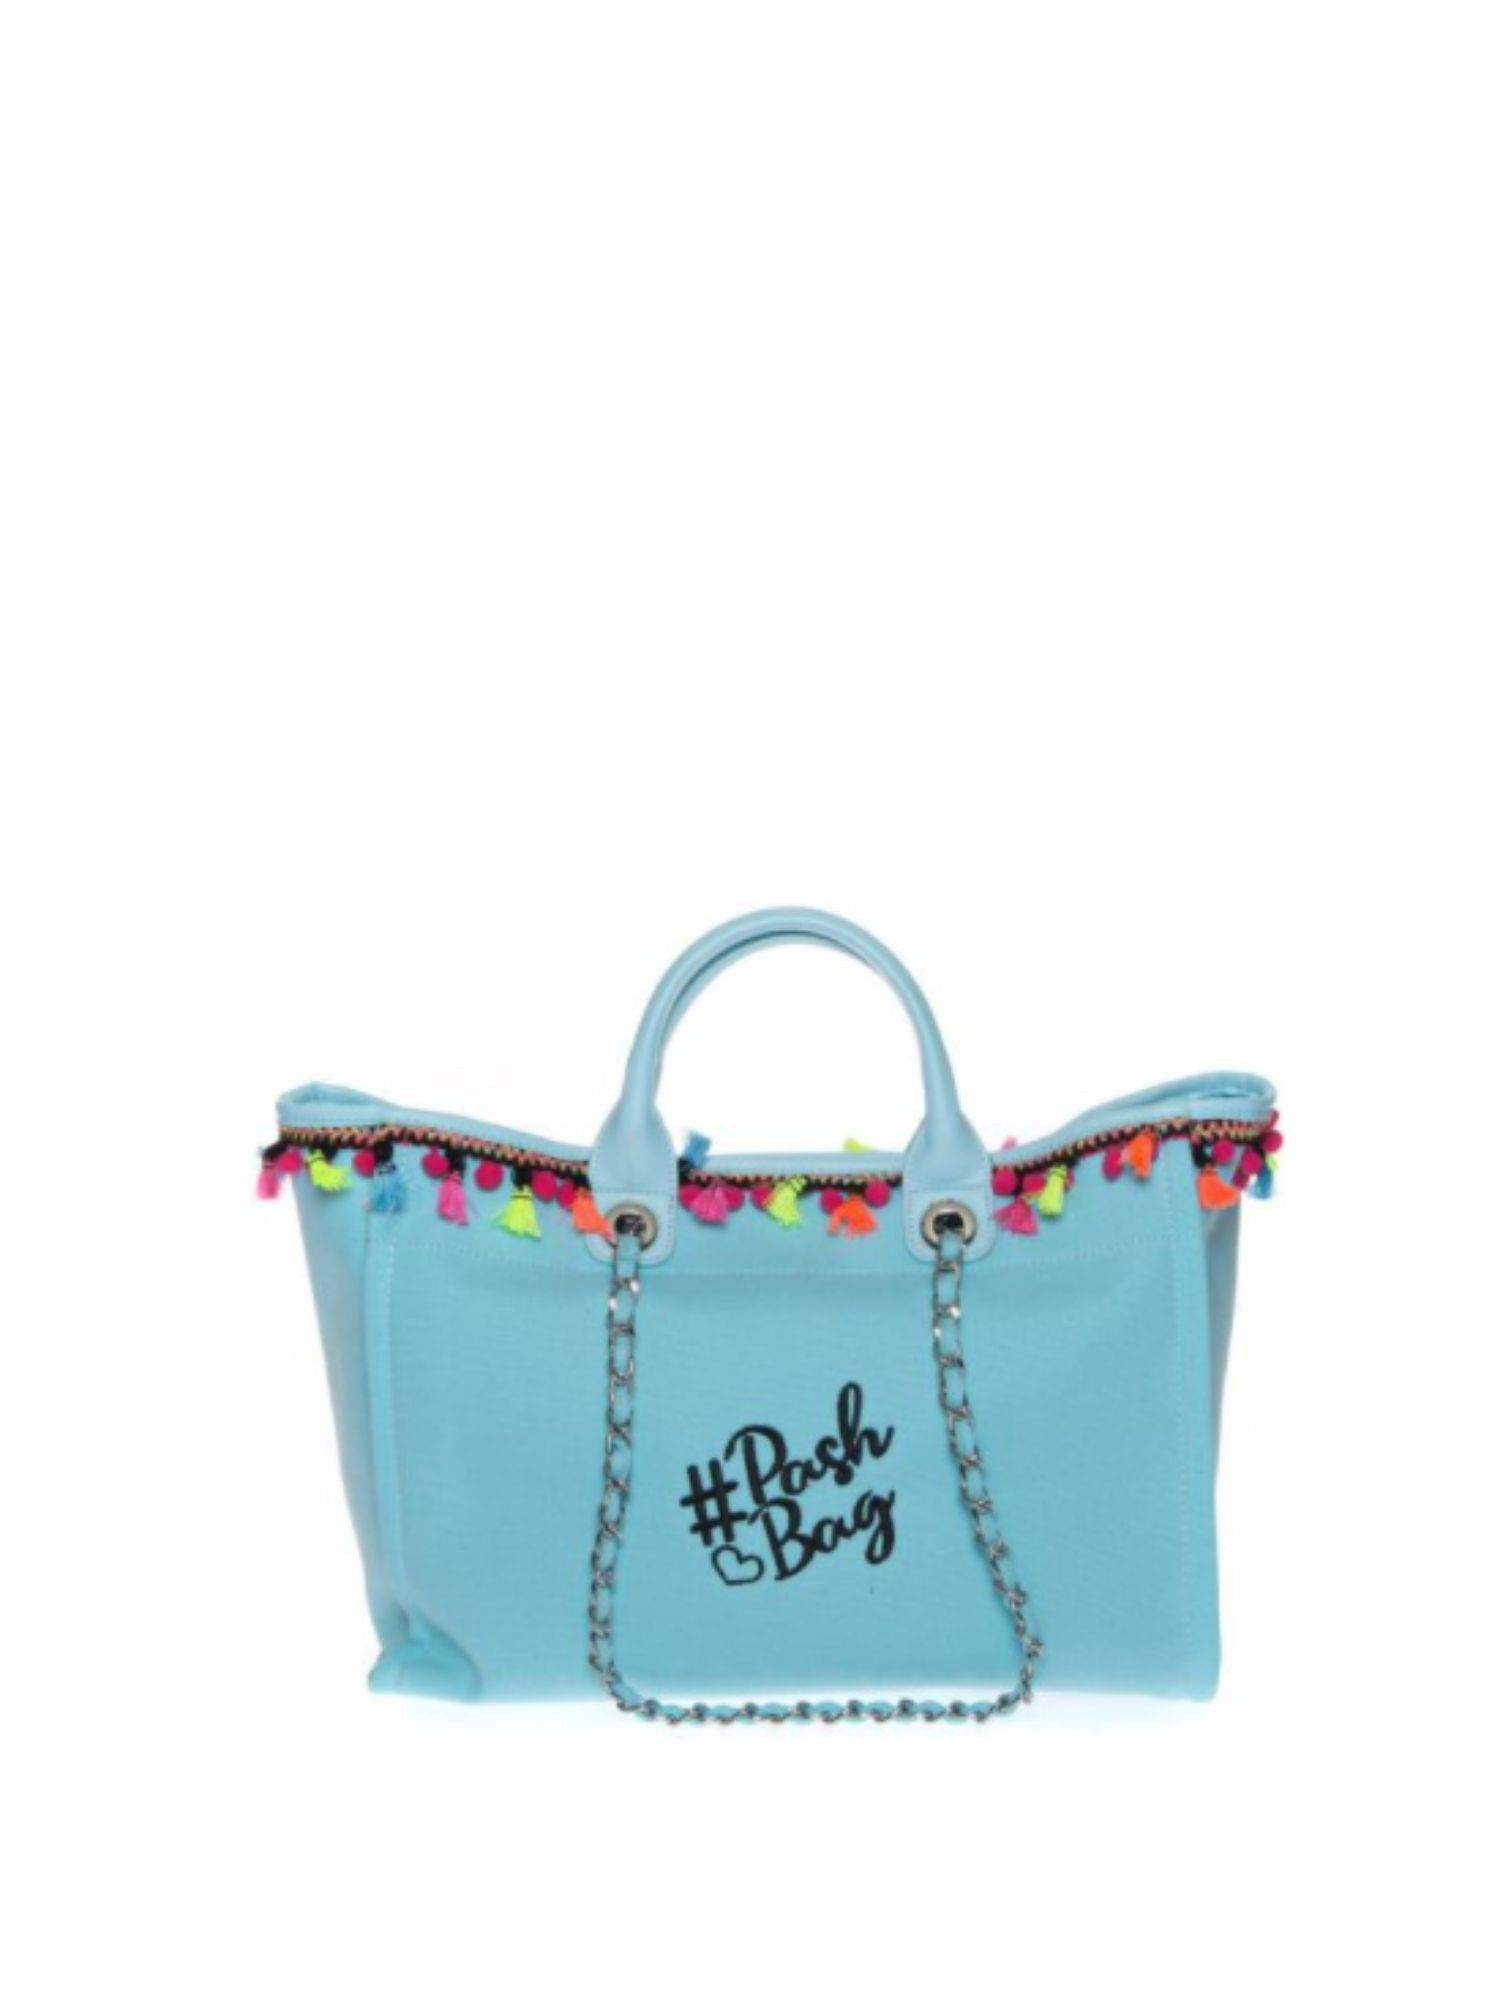 Borsa Atelier Du Sac Pash Bag 10999 Celeste